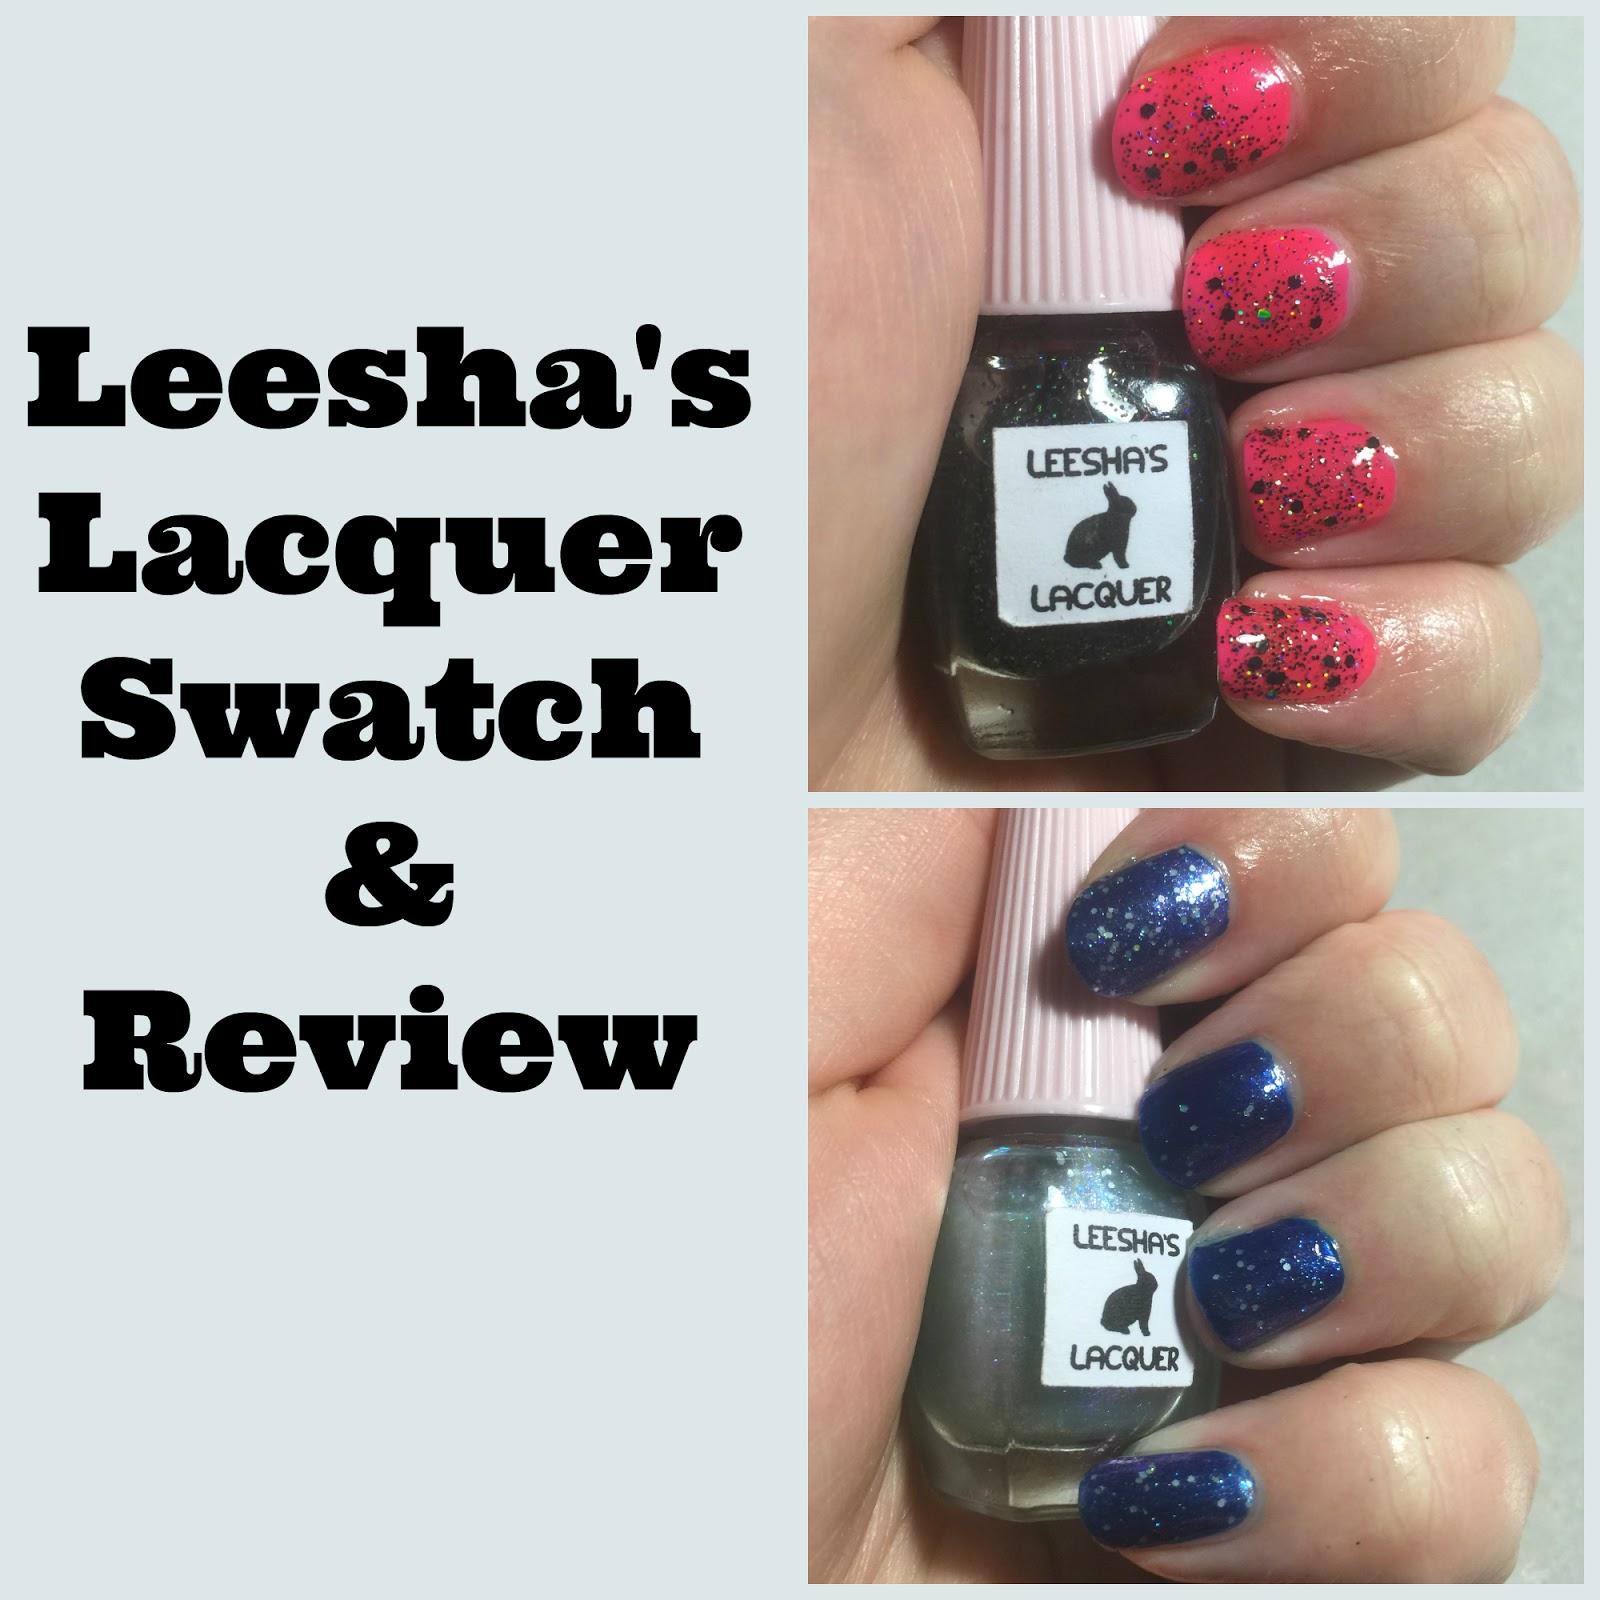 Leesha's Lacquer